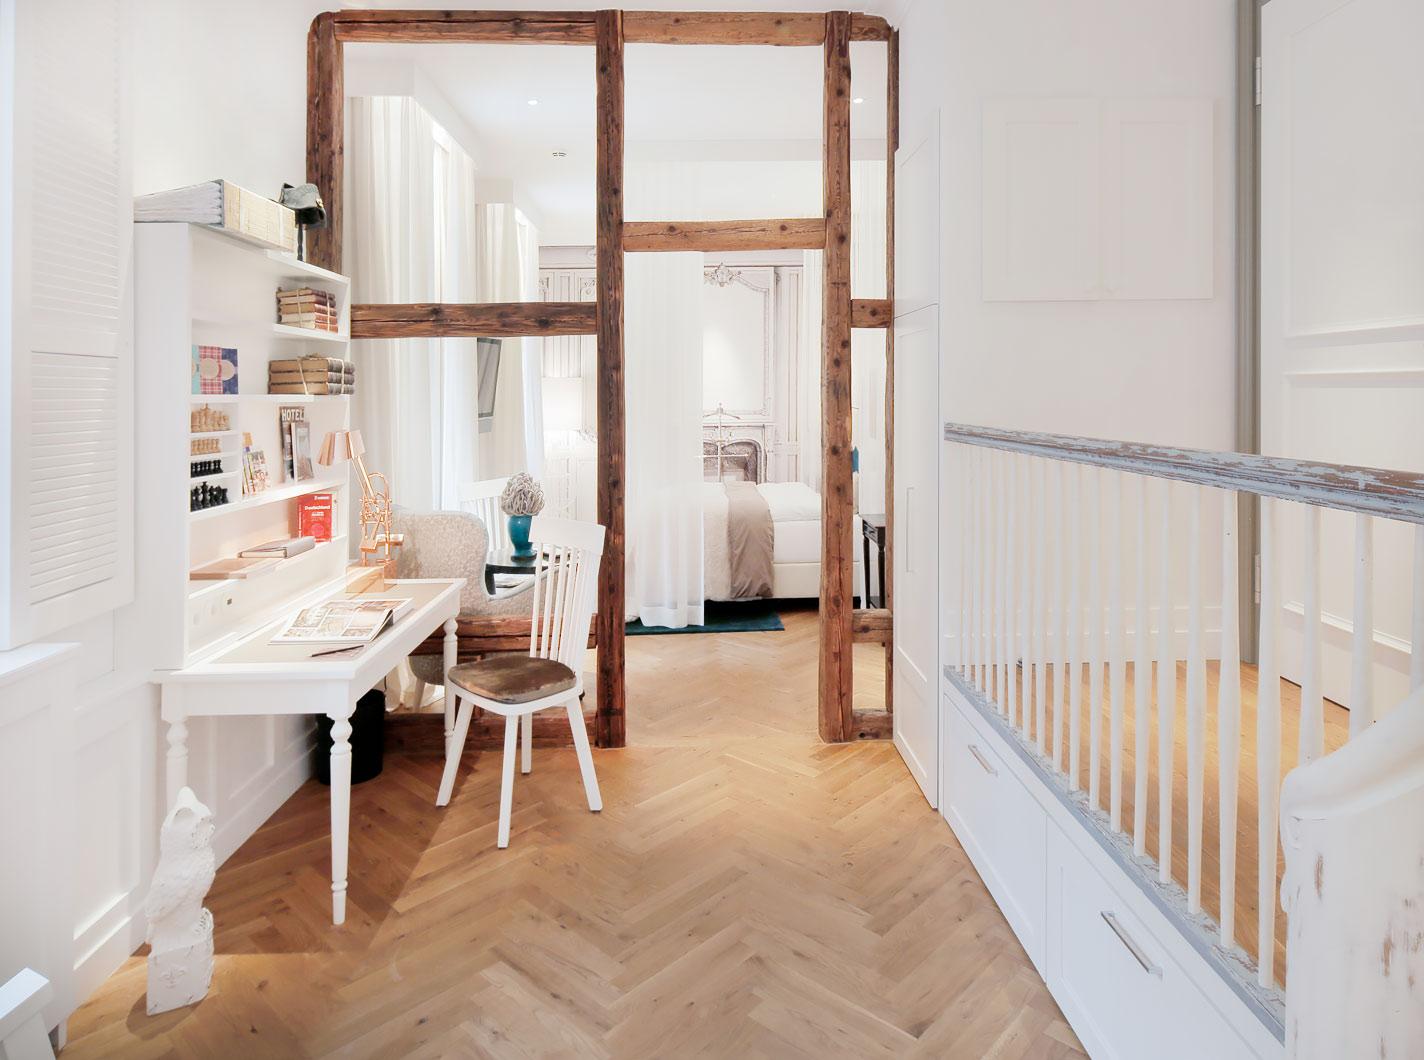 La Maison Hotel, Saarlouis › Pretty Hotels